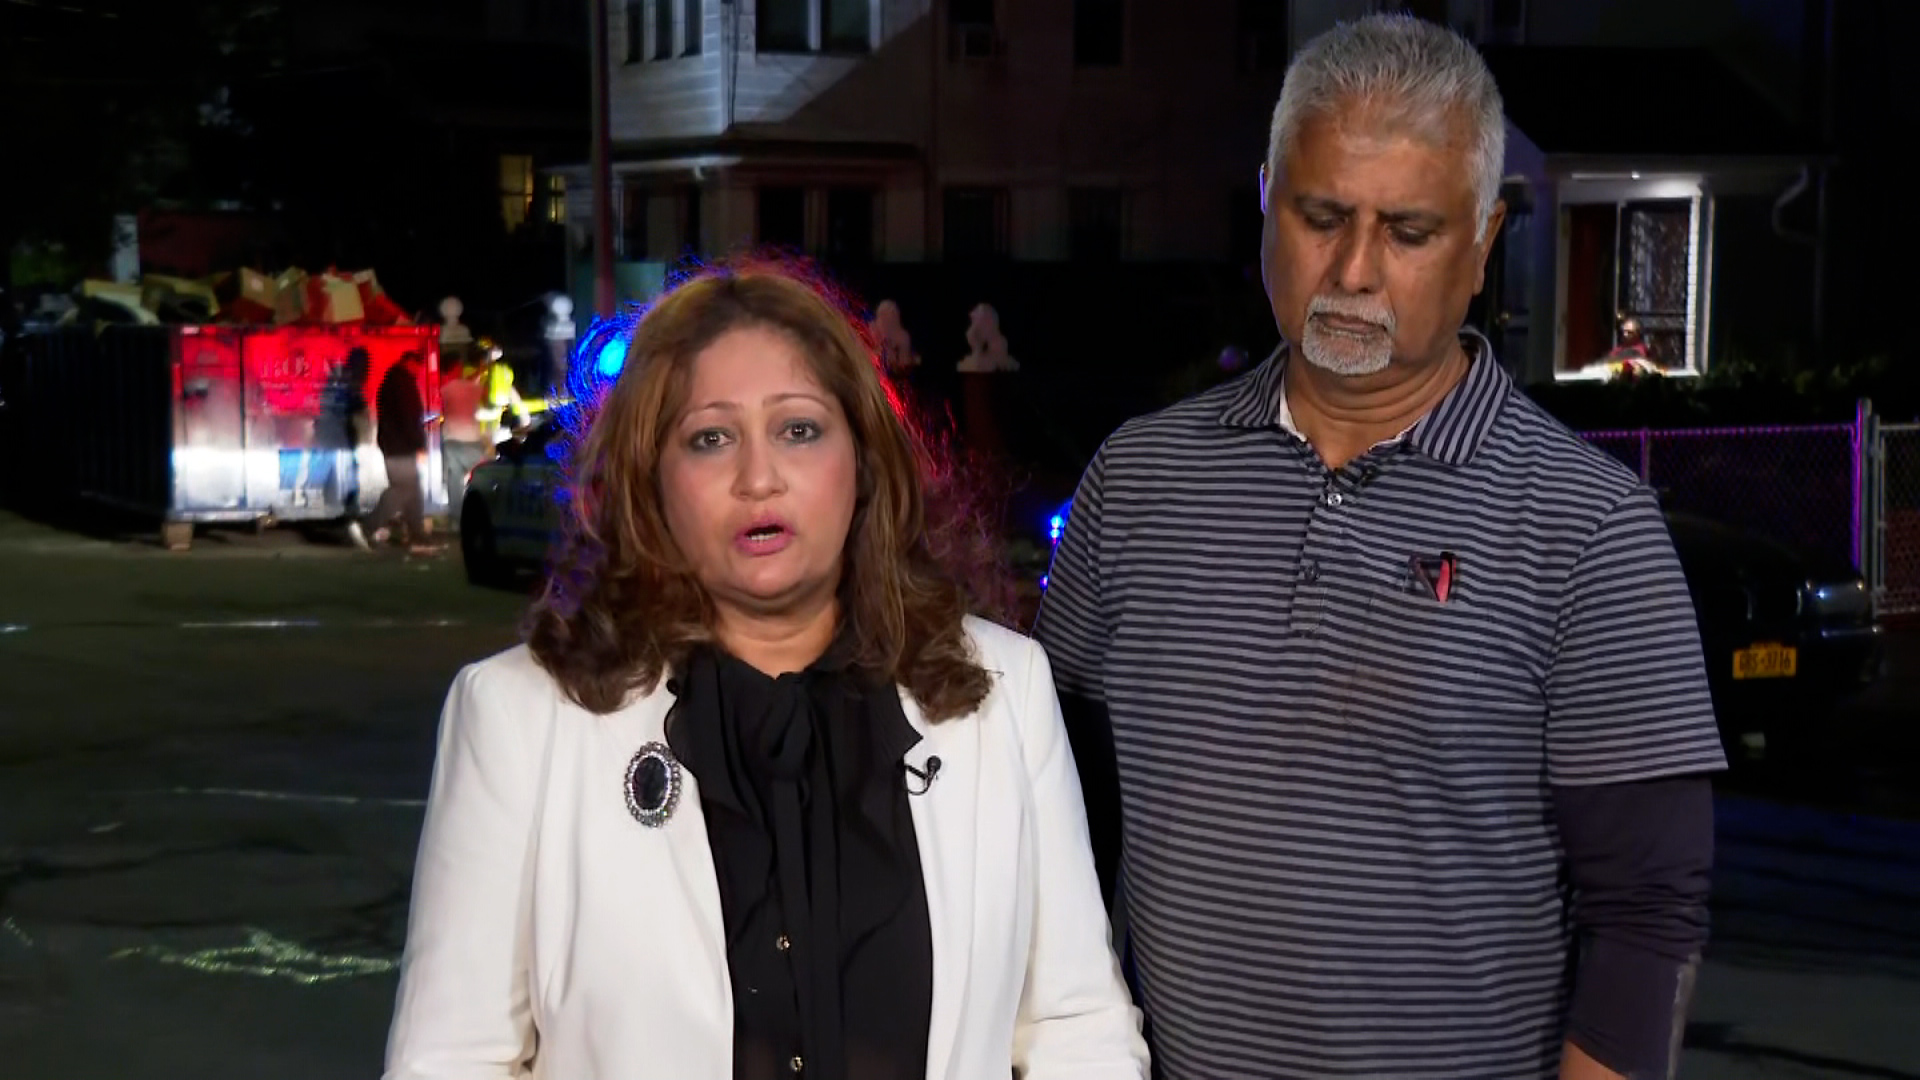 Amrita Bhagwandin, left, speaks alongside her husband, Sahadeo Bhagwandin, during an interview on September 2.